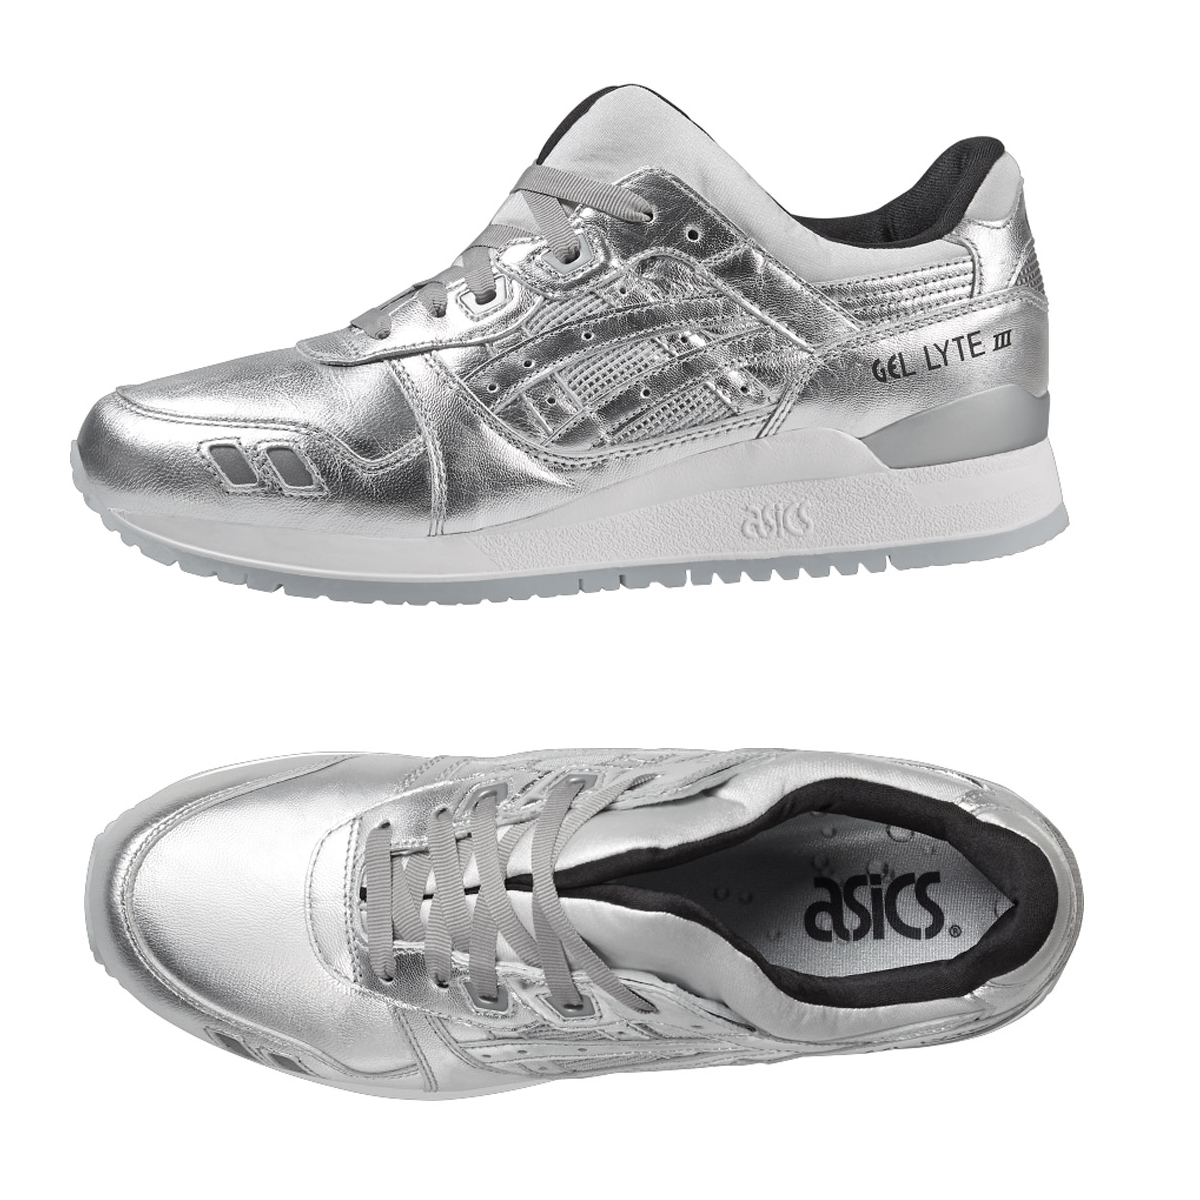 Asics Gel Lyte III Sneaker Lifestyle HL504 9393 Damen Damen 9393 Herren Unisex 541fee